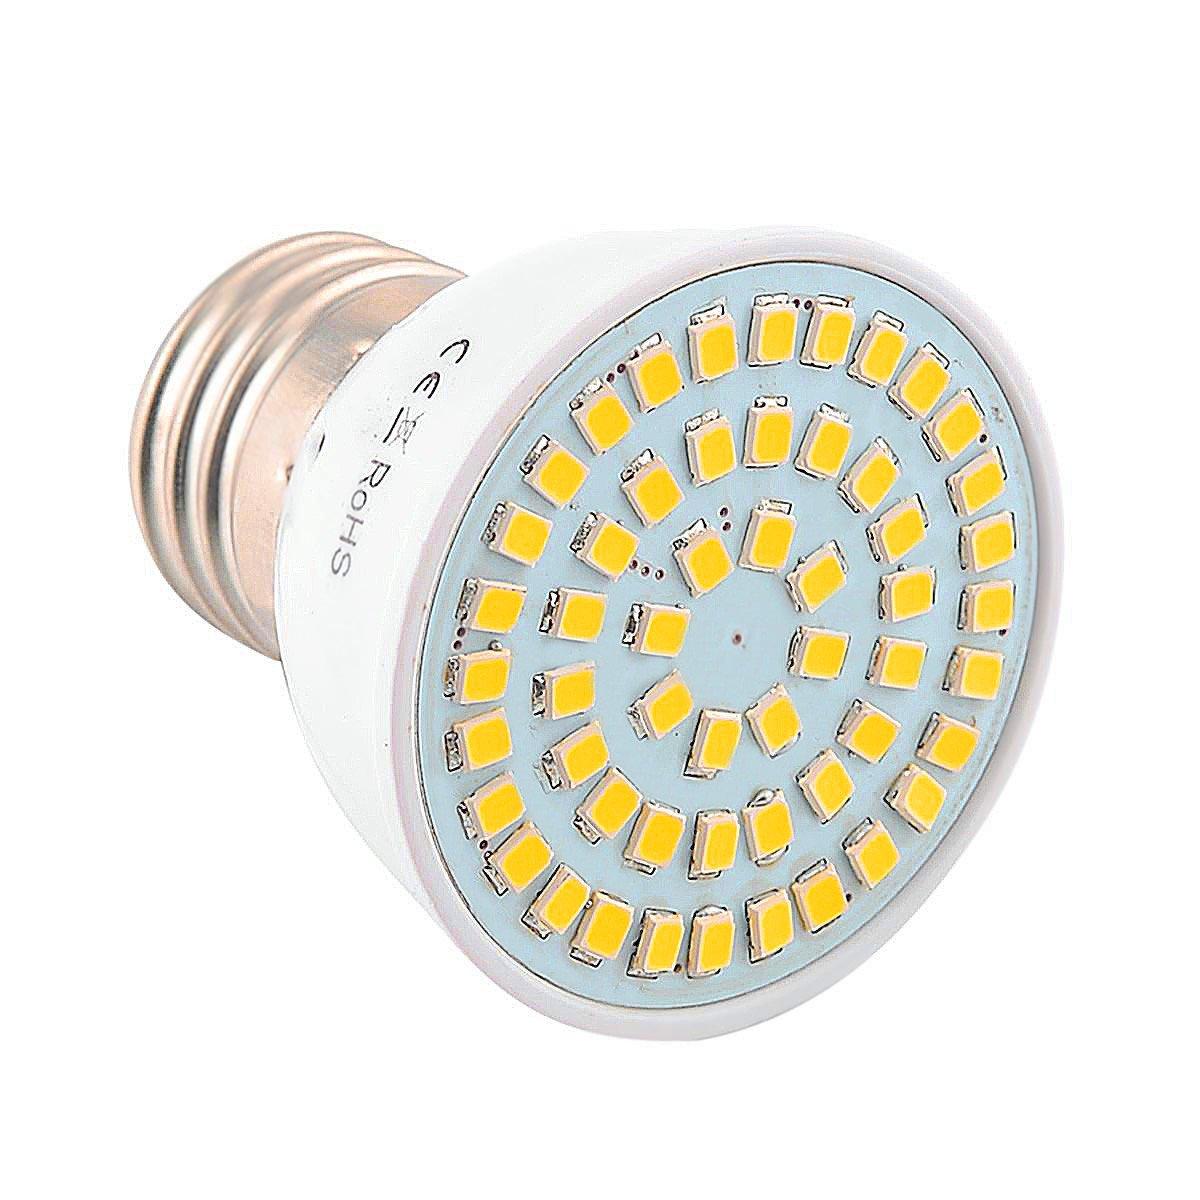 YLiansong LED-Flutlichtlampe, 54 LED 5 Watt LED E27 / E26 2835SMD 400-500Lm Warmweiß Kaltweiß Natürliche Weiße LED Spotlight (AC 110 V / AC220V) [Energieklasse A +] (Color : Cool White, Size : 110V)